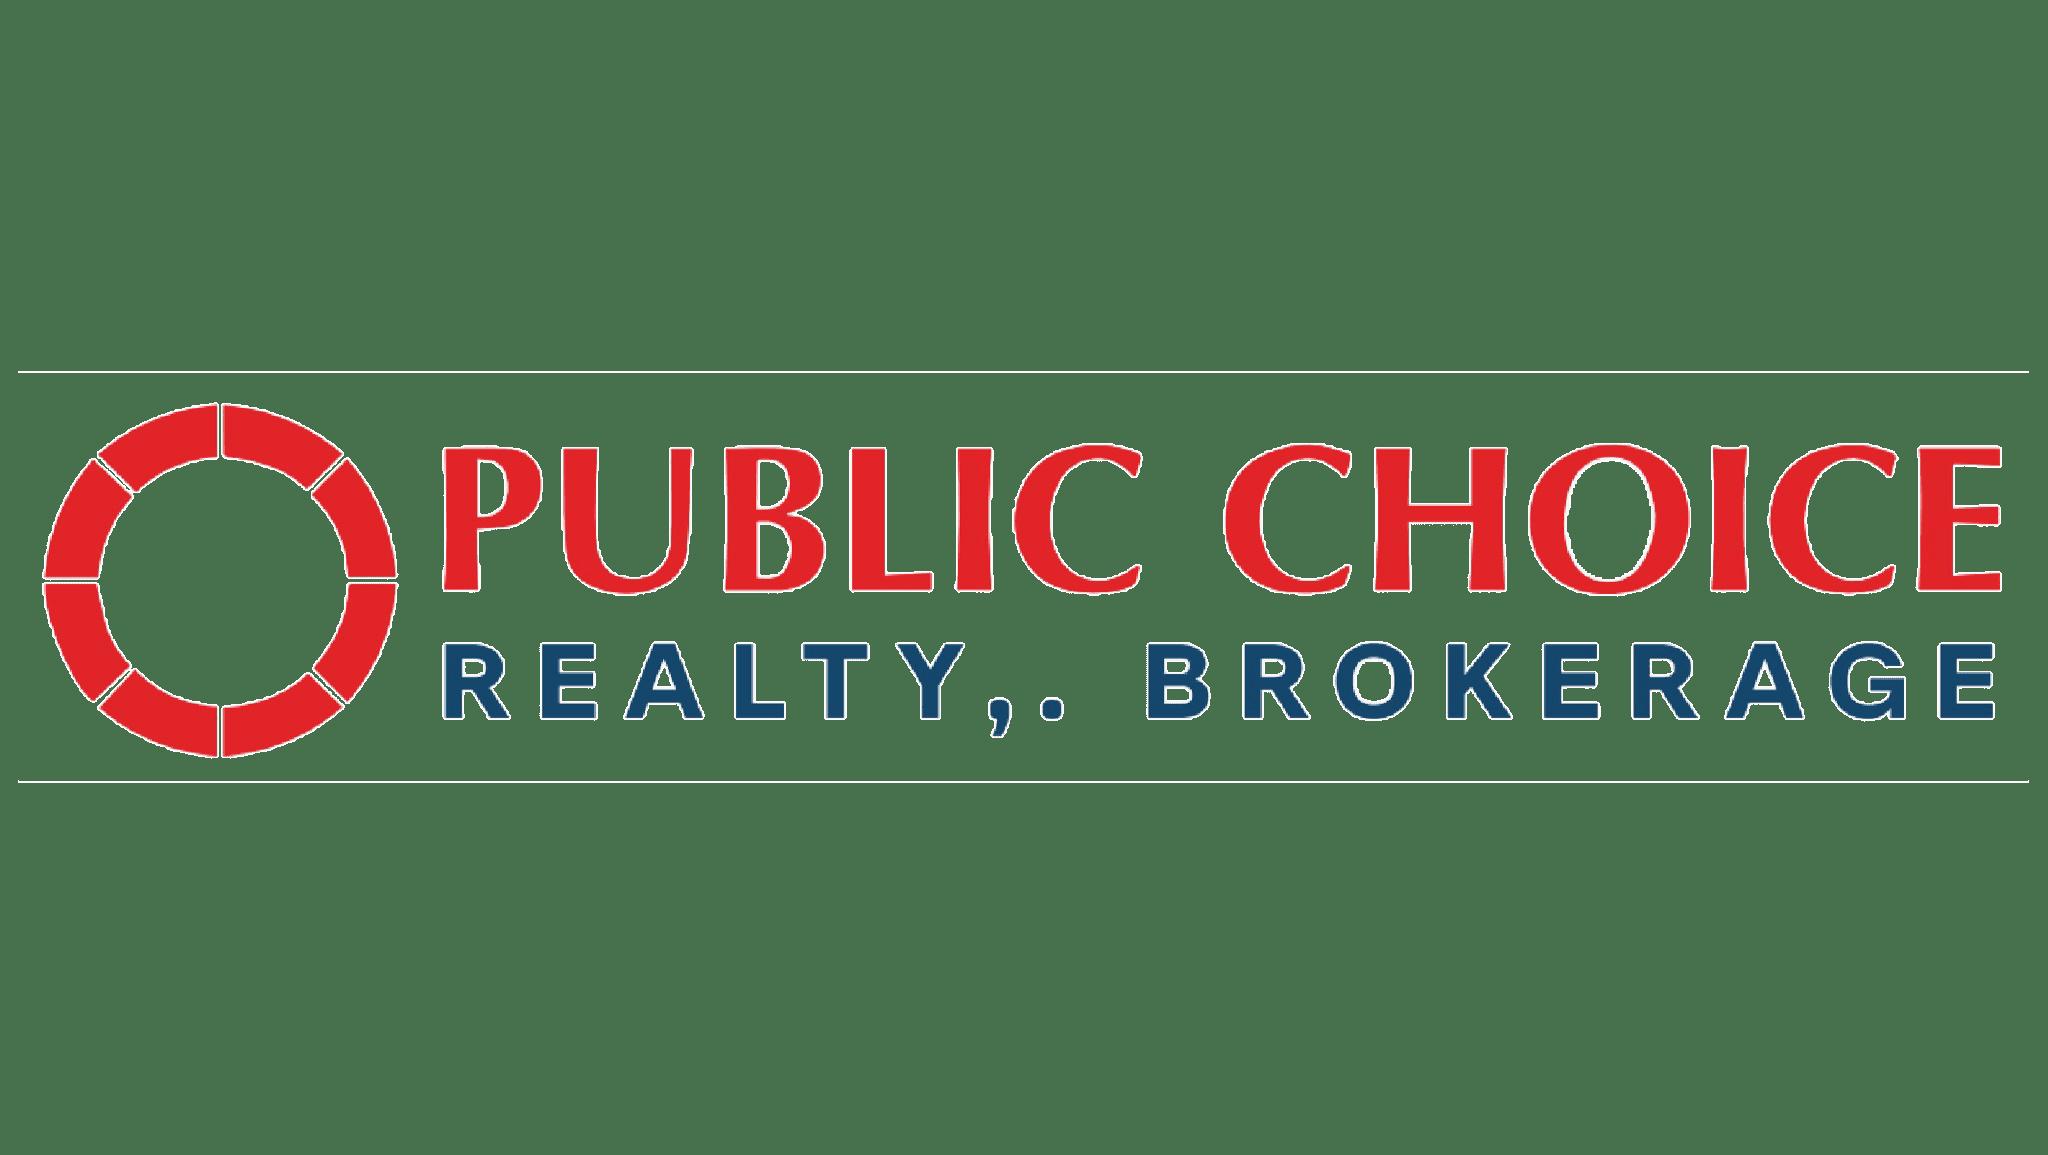 Public-Choice-Realty-Brokerage-Logo